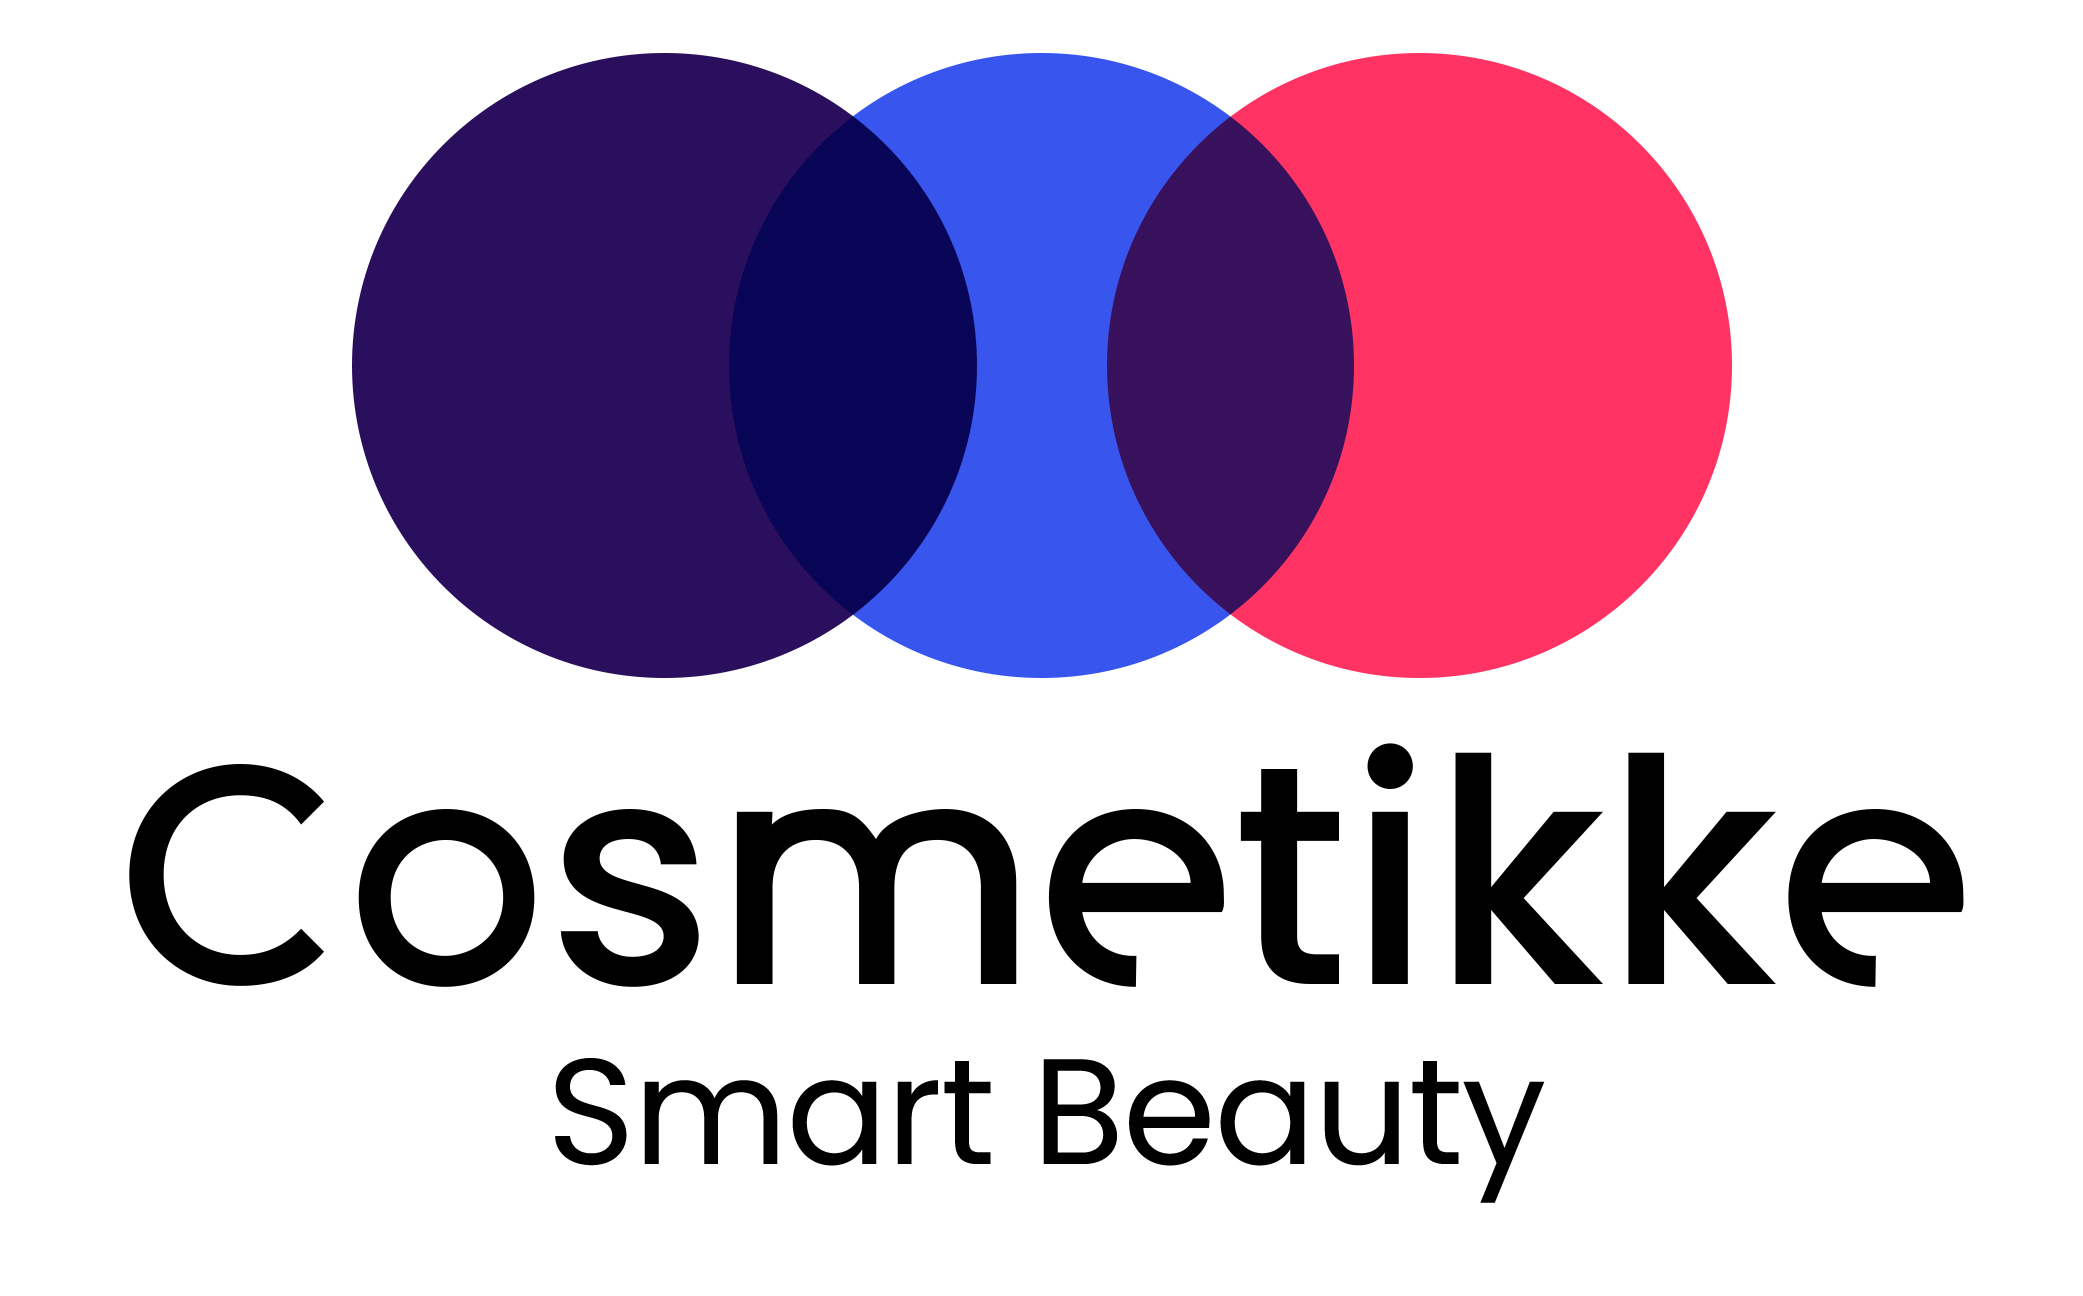 Bildmarke: Cosmetikke - Smart Beauty